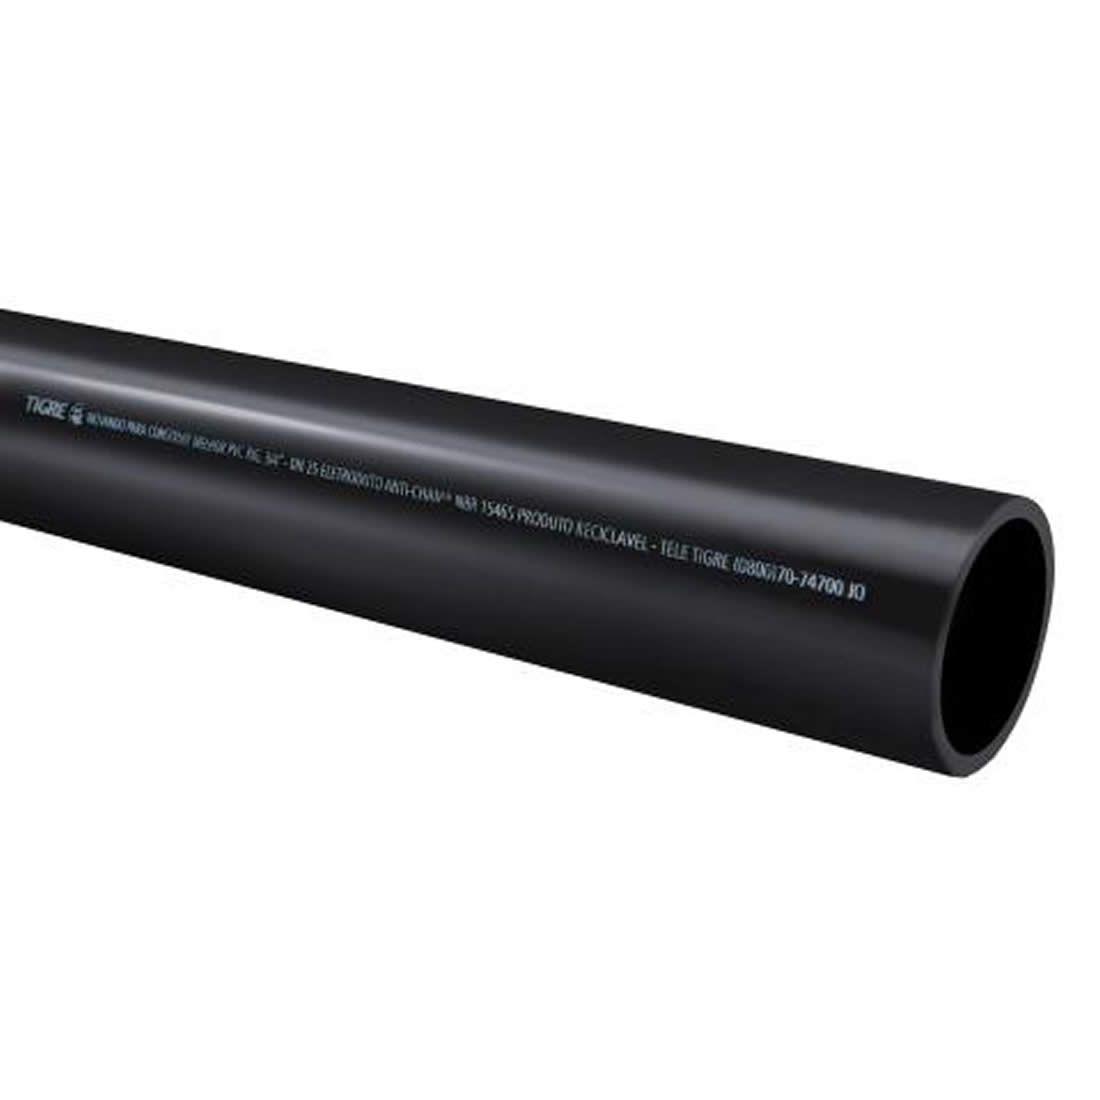 Tubo Eletroduto Soldável Antichama 32mm X 3 Metros Tigre